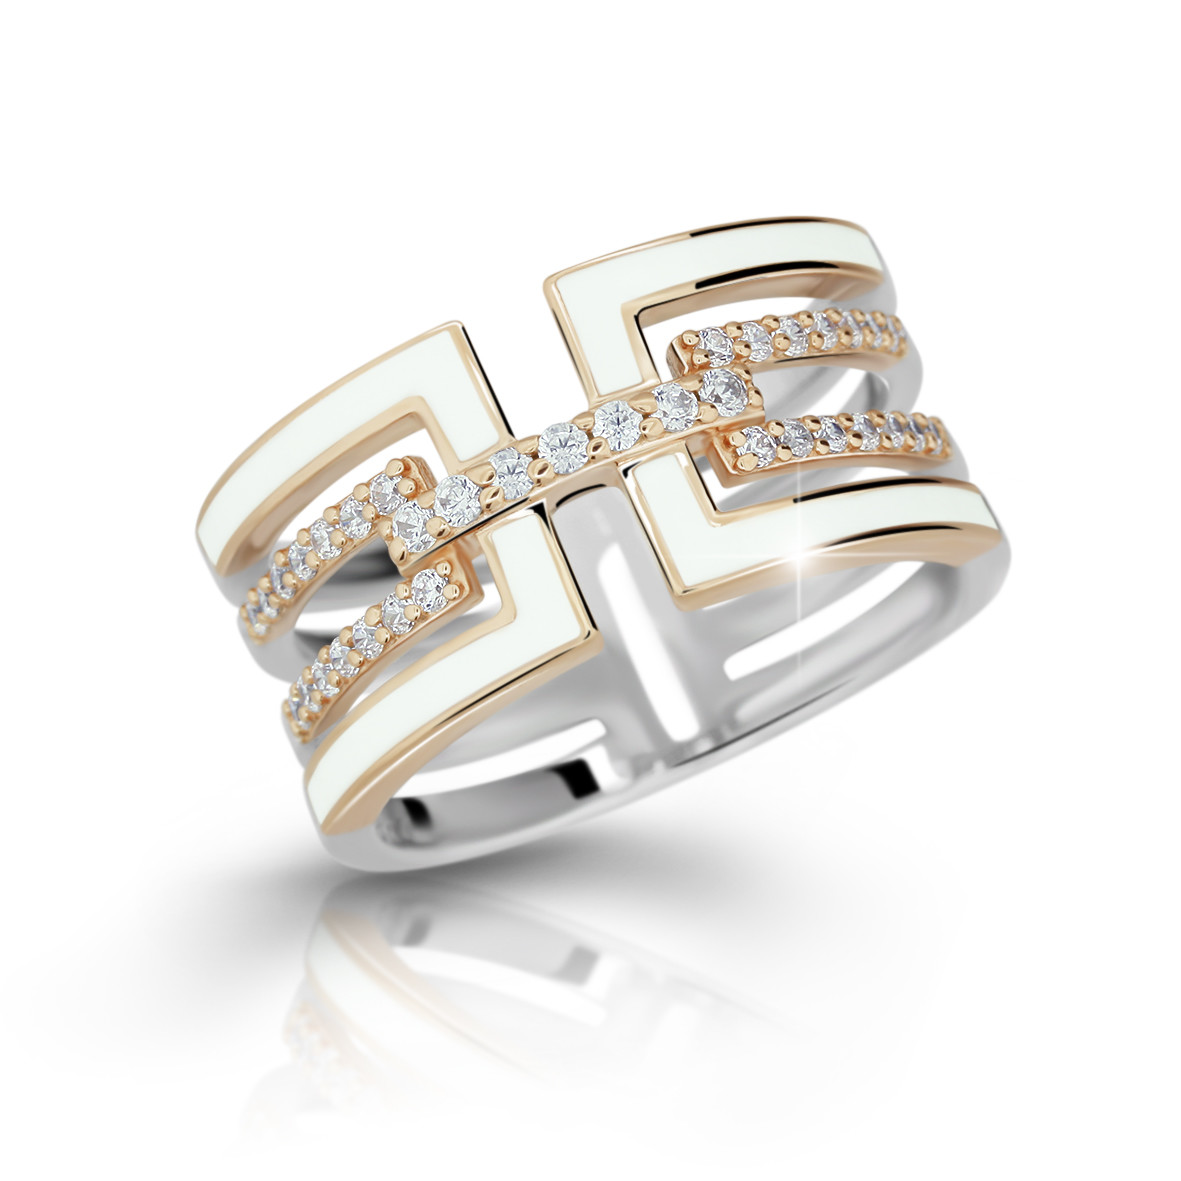 MODESI M11072 Ring Rose Plated White Enamel